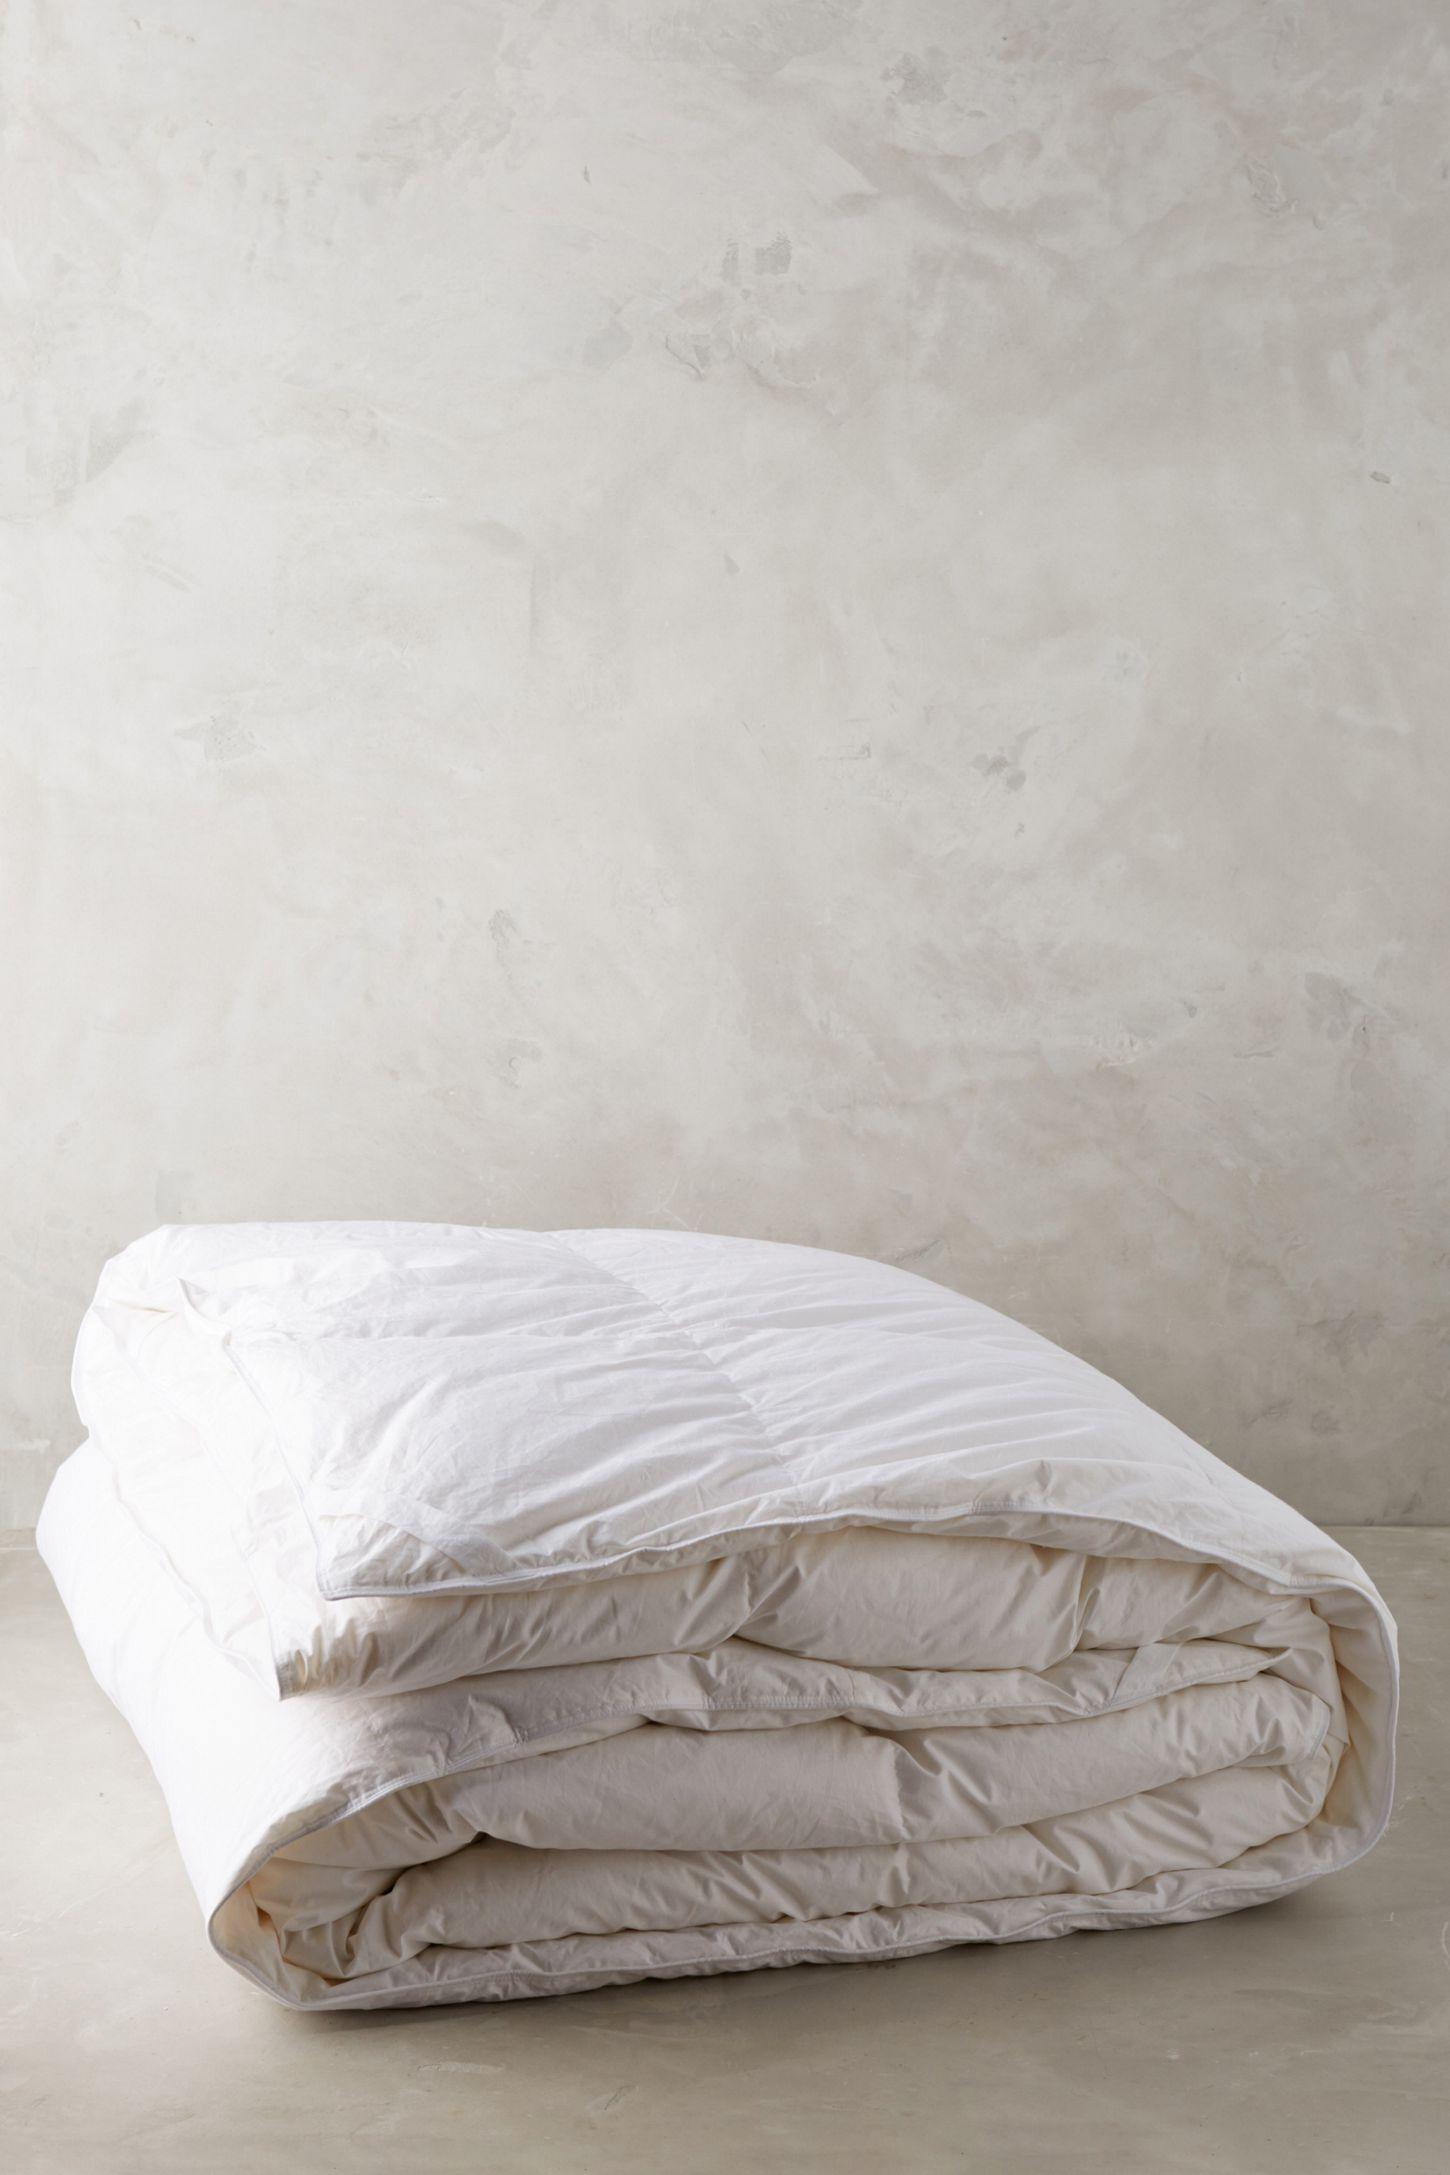 item cotton blanket down silk from size bedding duvets feather duvet sidanda comforter quilt fabric in through goose shidanda cut comforters white king